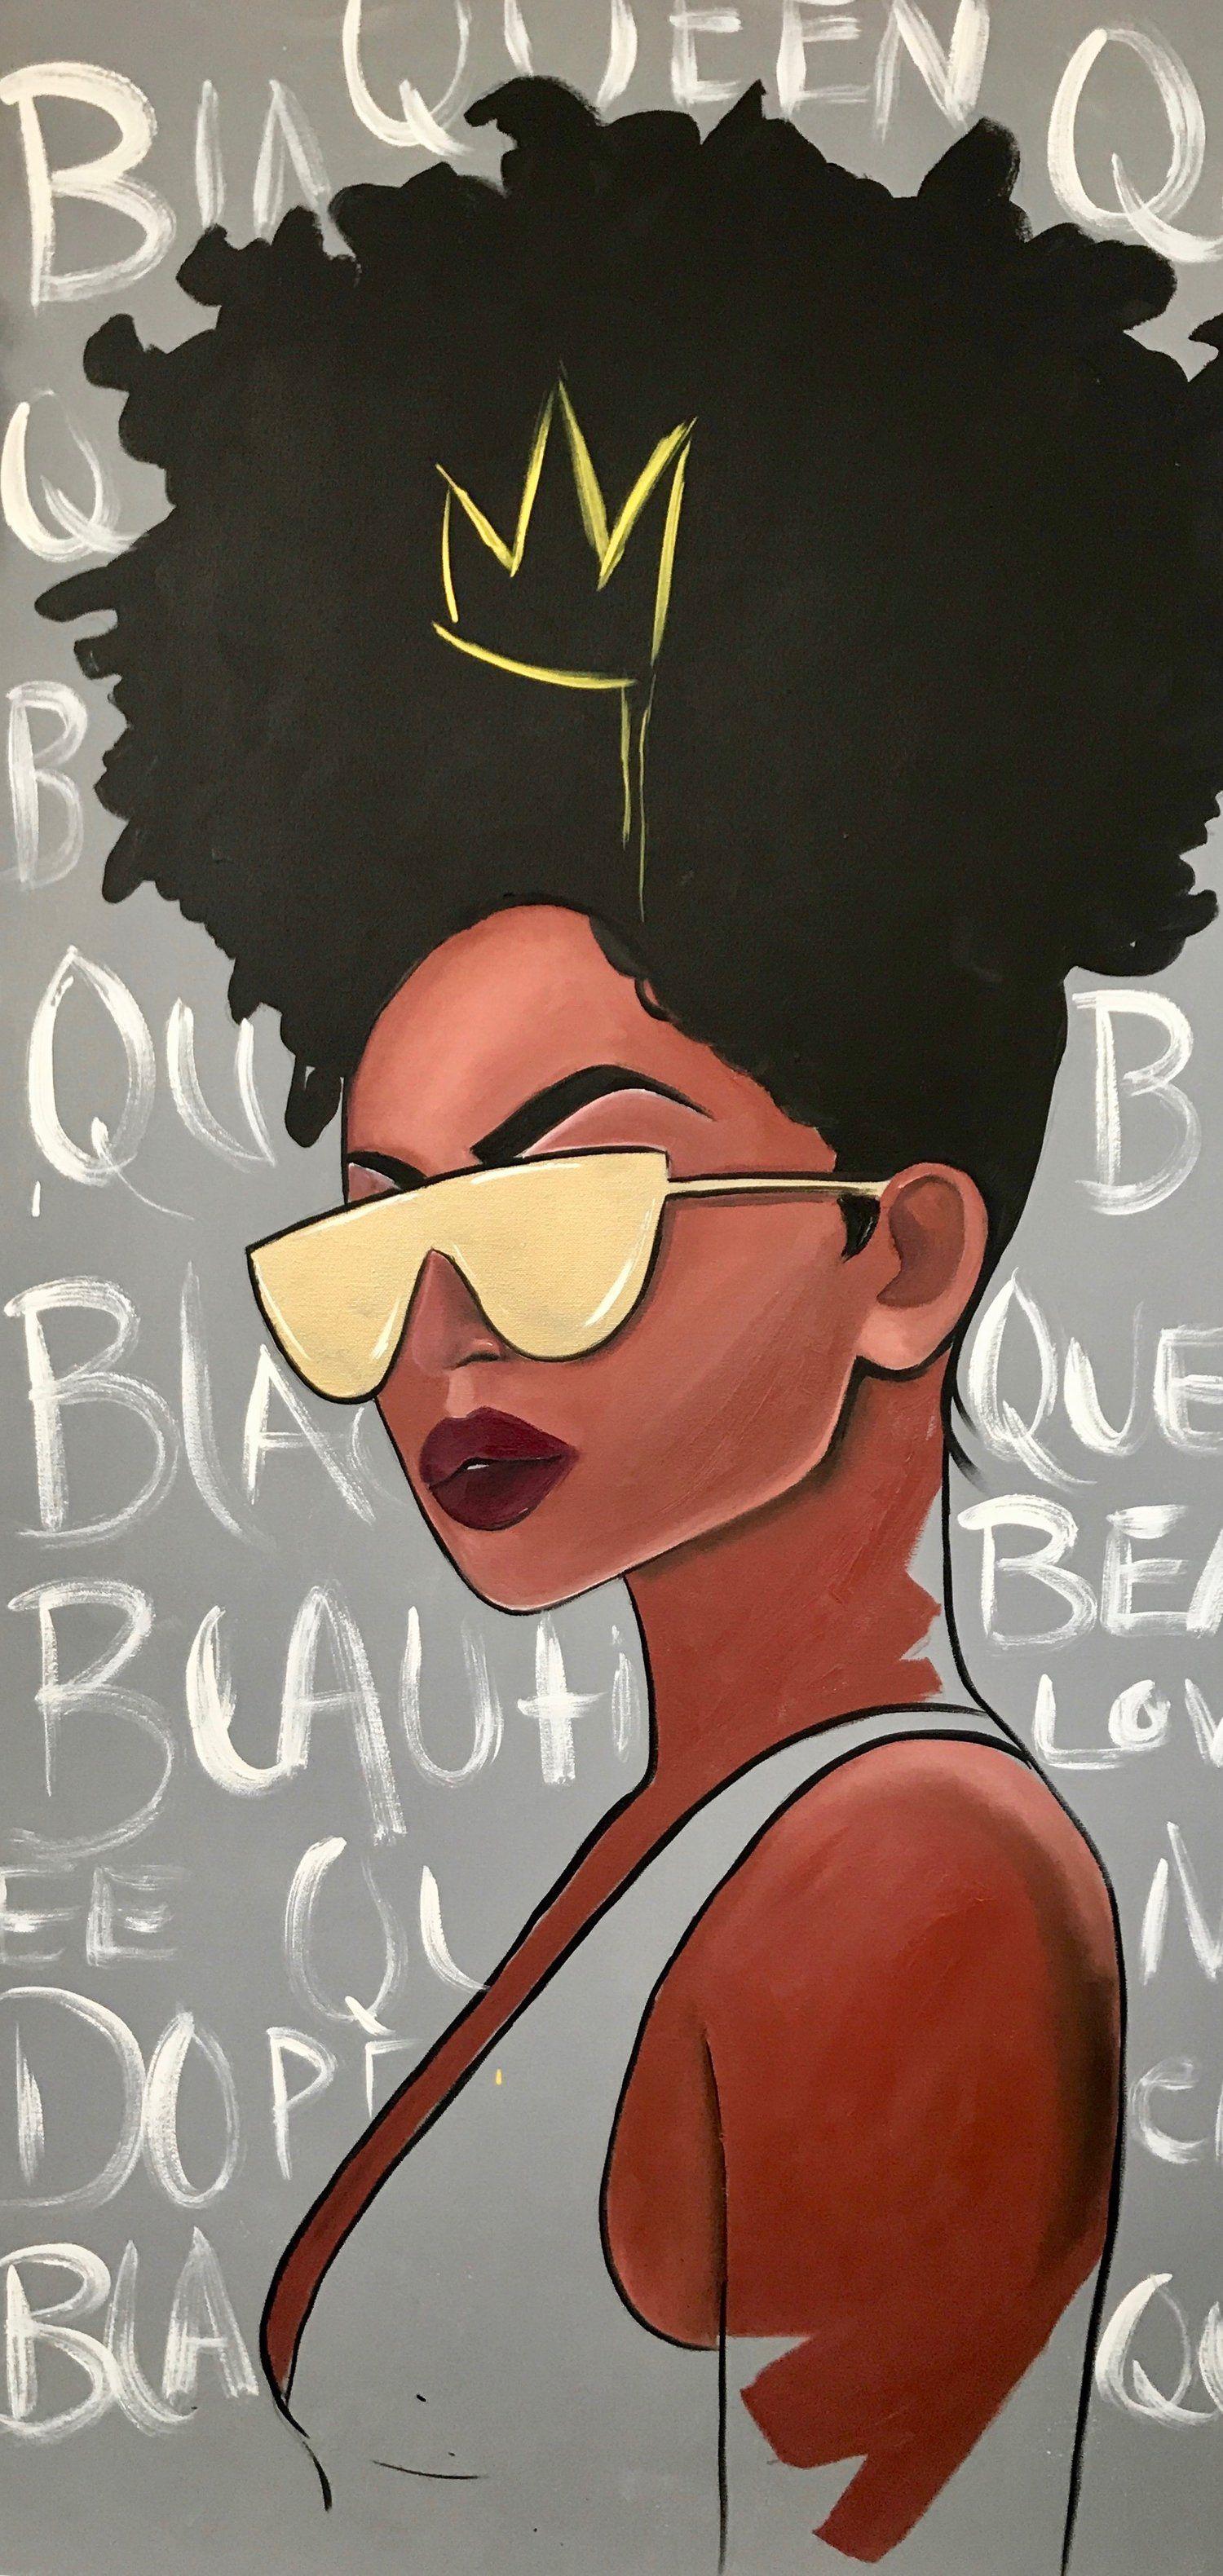 Image of Black Queen Black art painting, Black girl